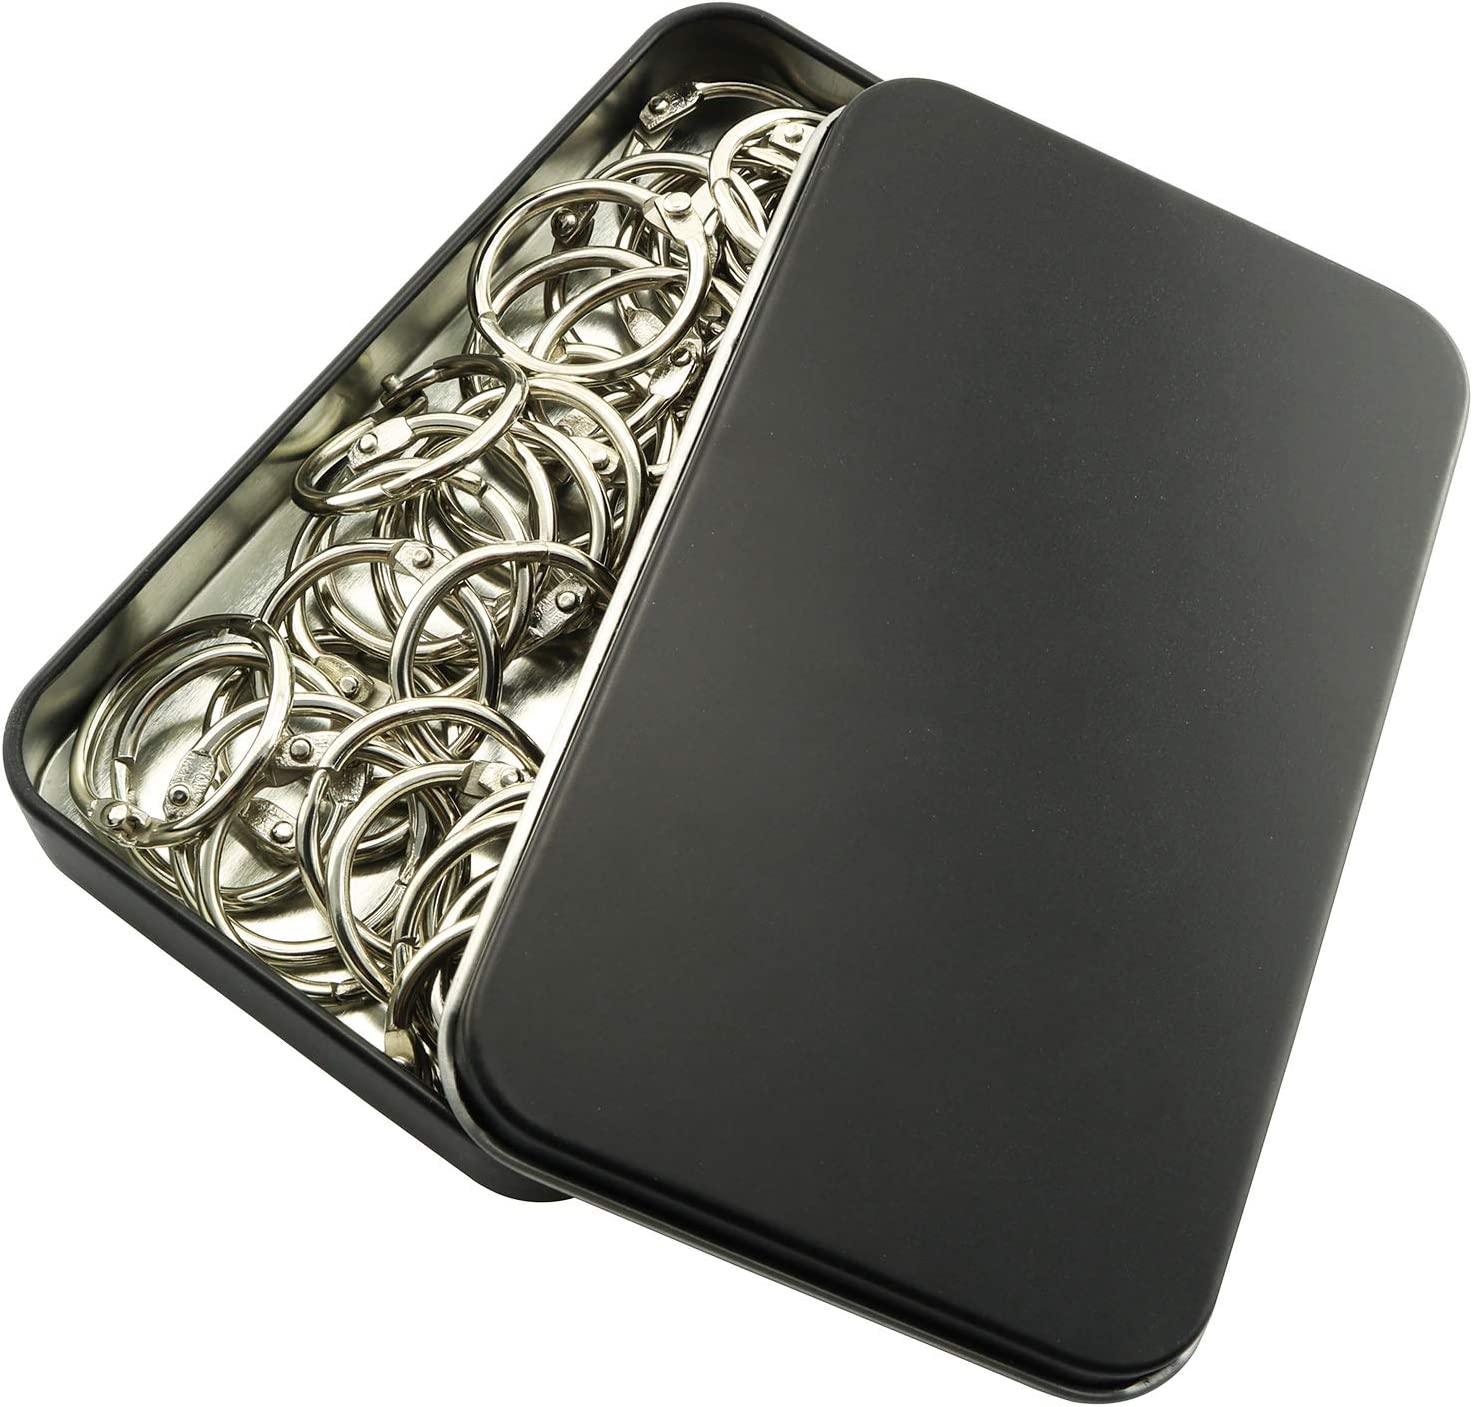 PSCCO Max 83% OFF 50pcs 1 inch Japan Maker New Book Ring Metal Binder Loose Rings Leaf